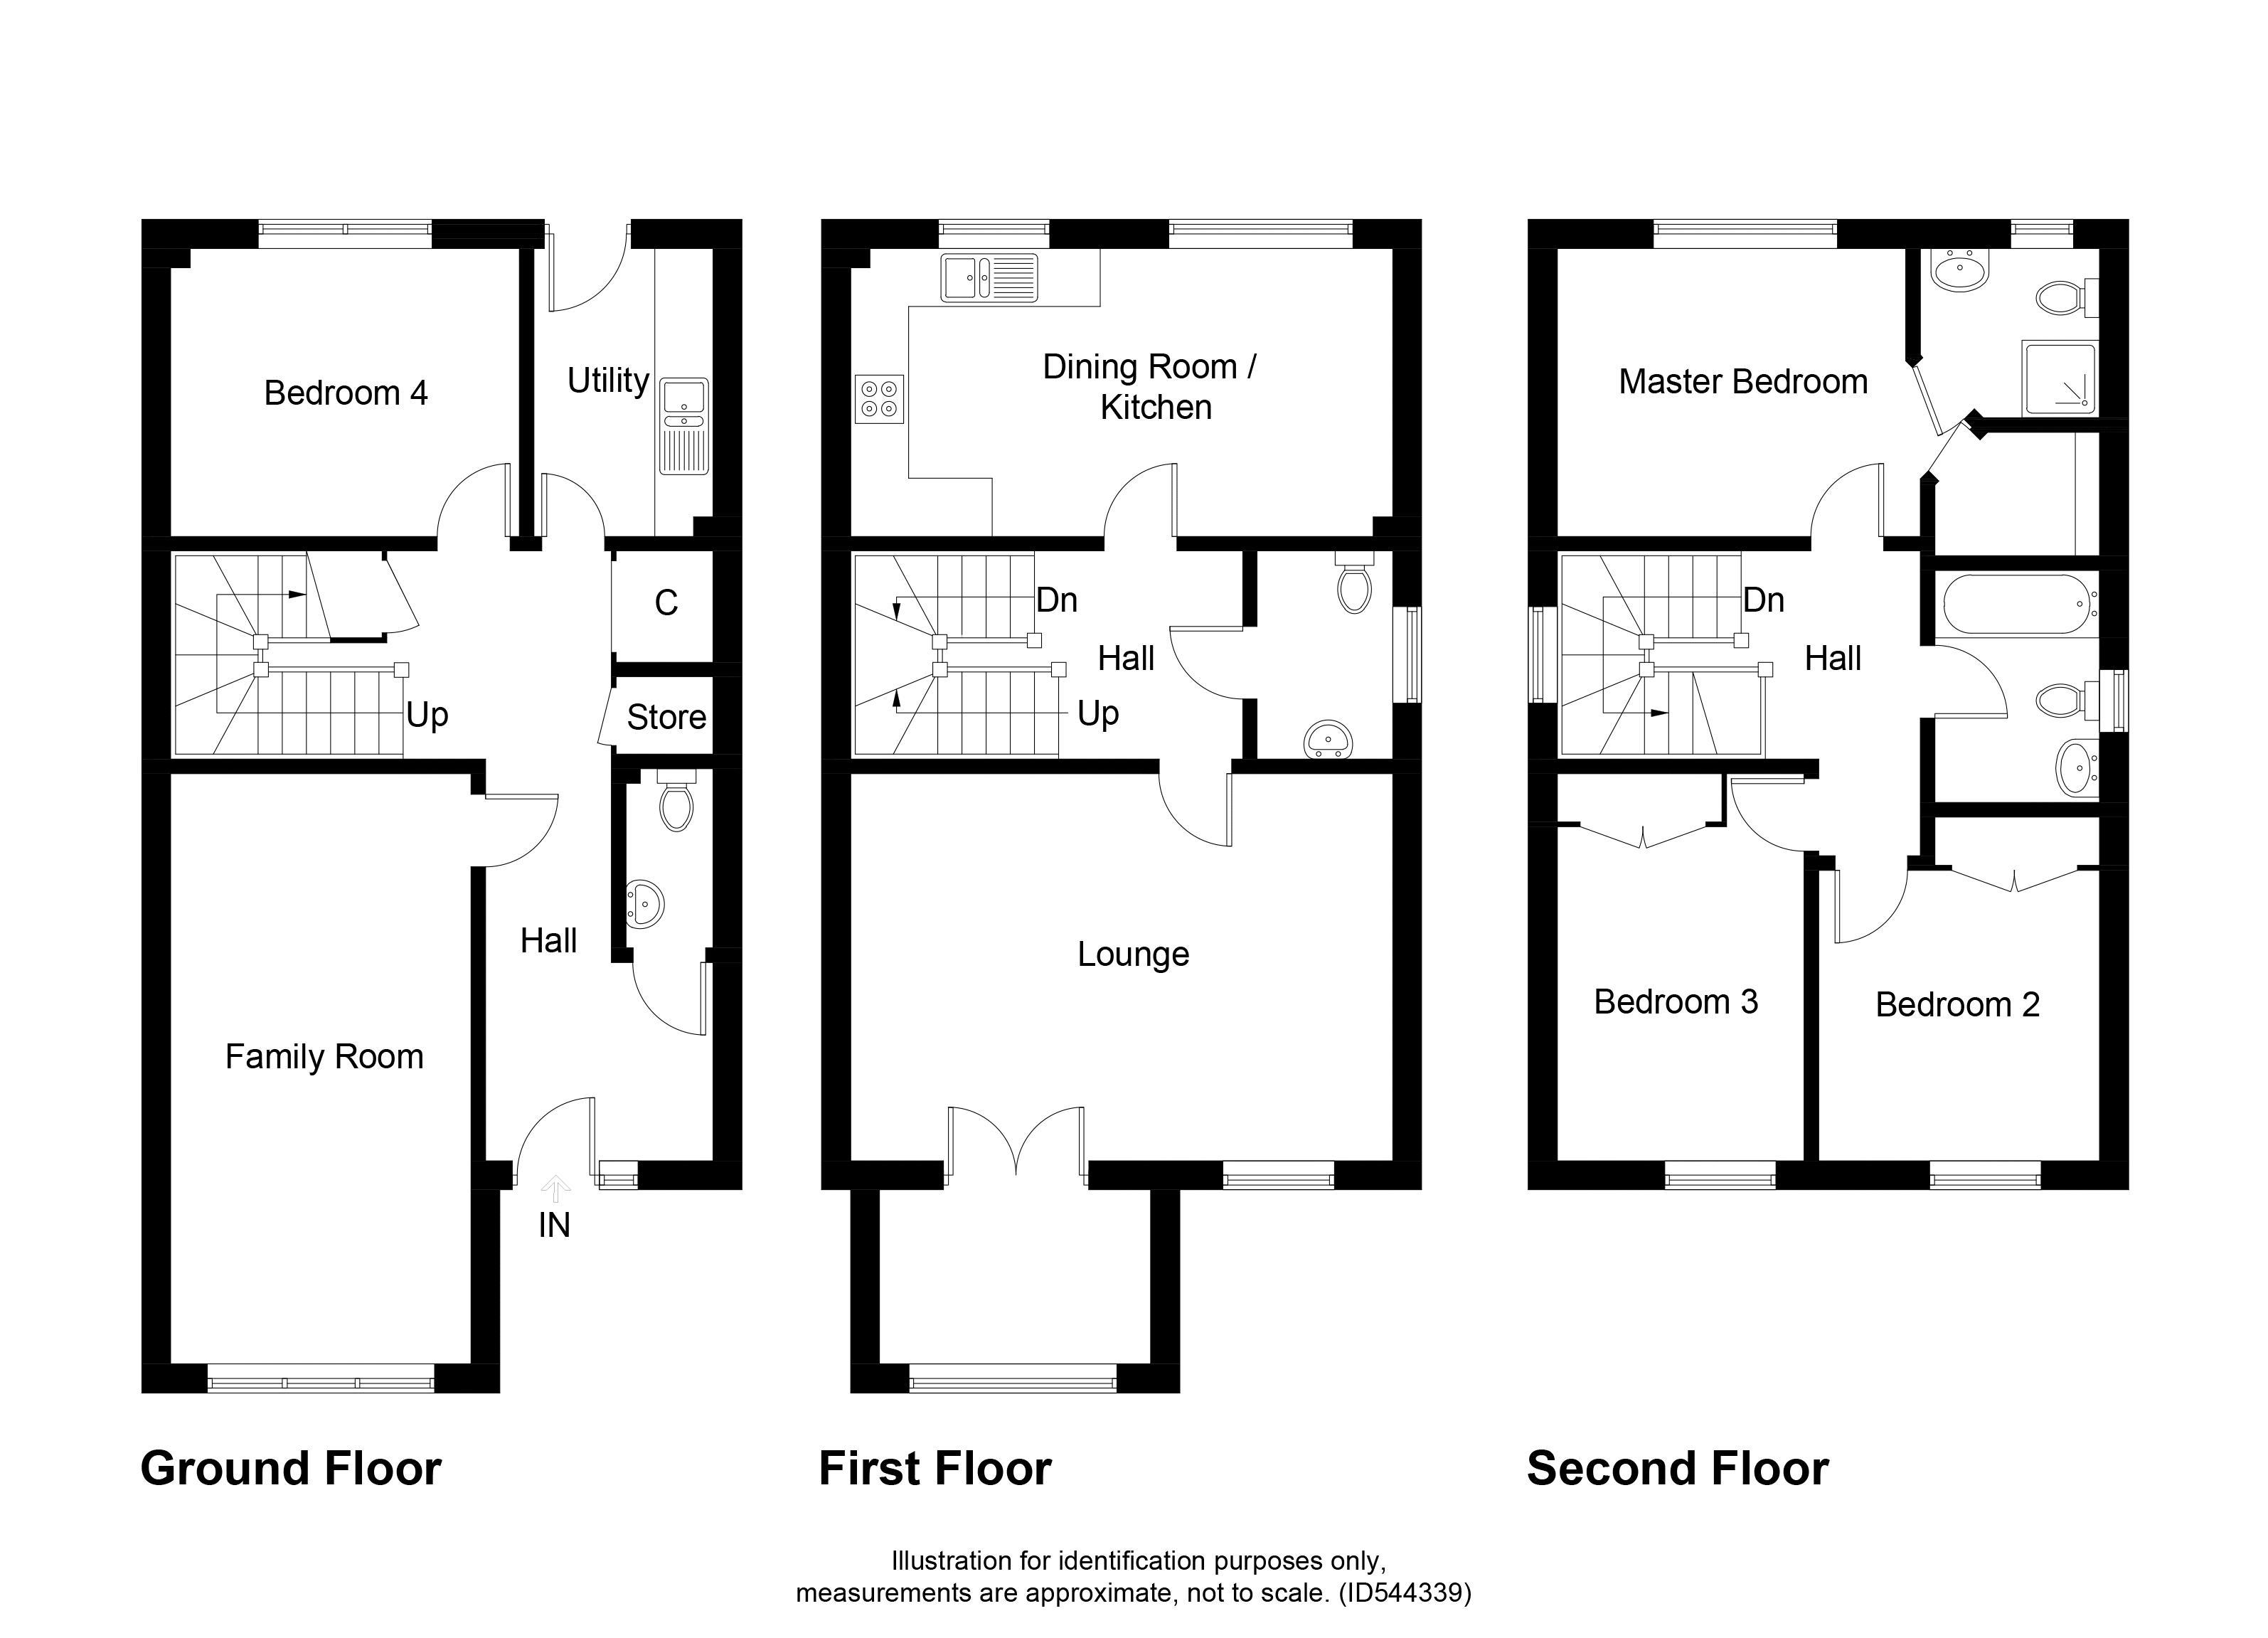 94 Lochan Road Floorplan